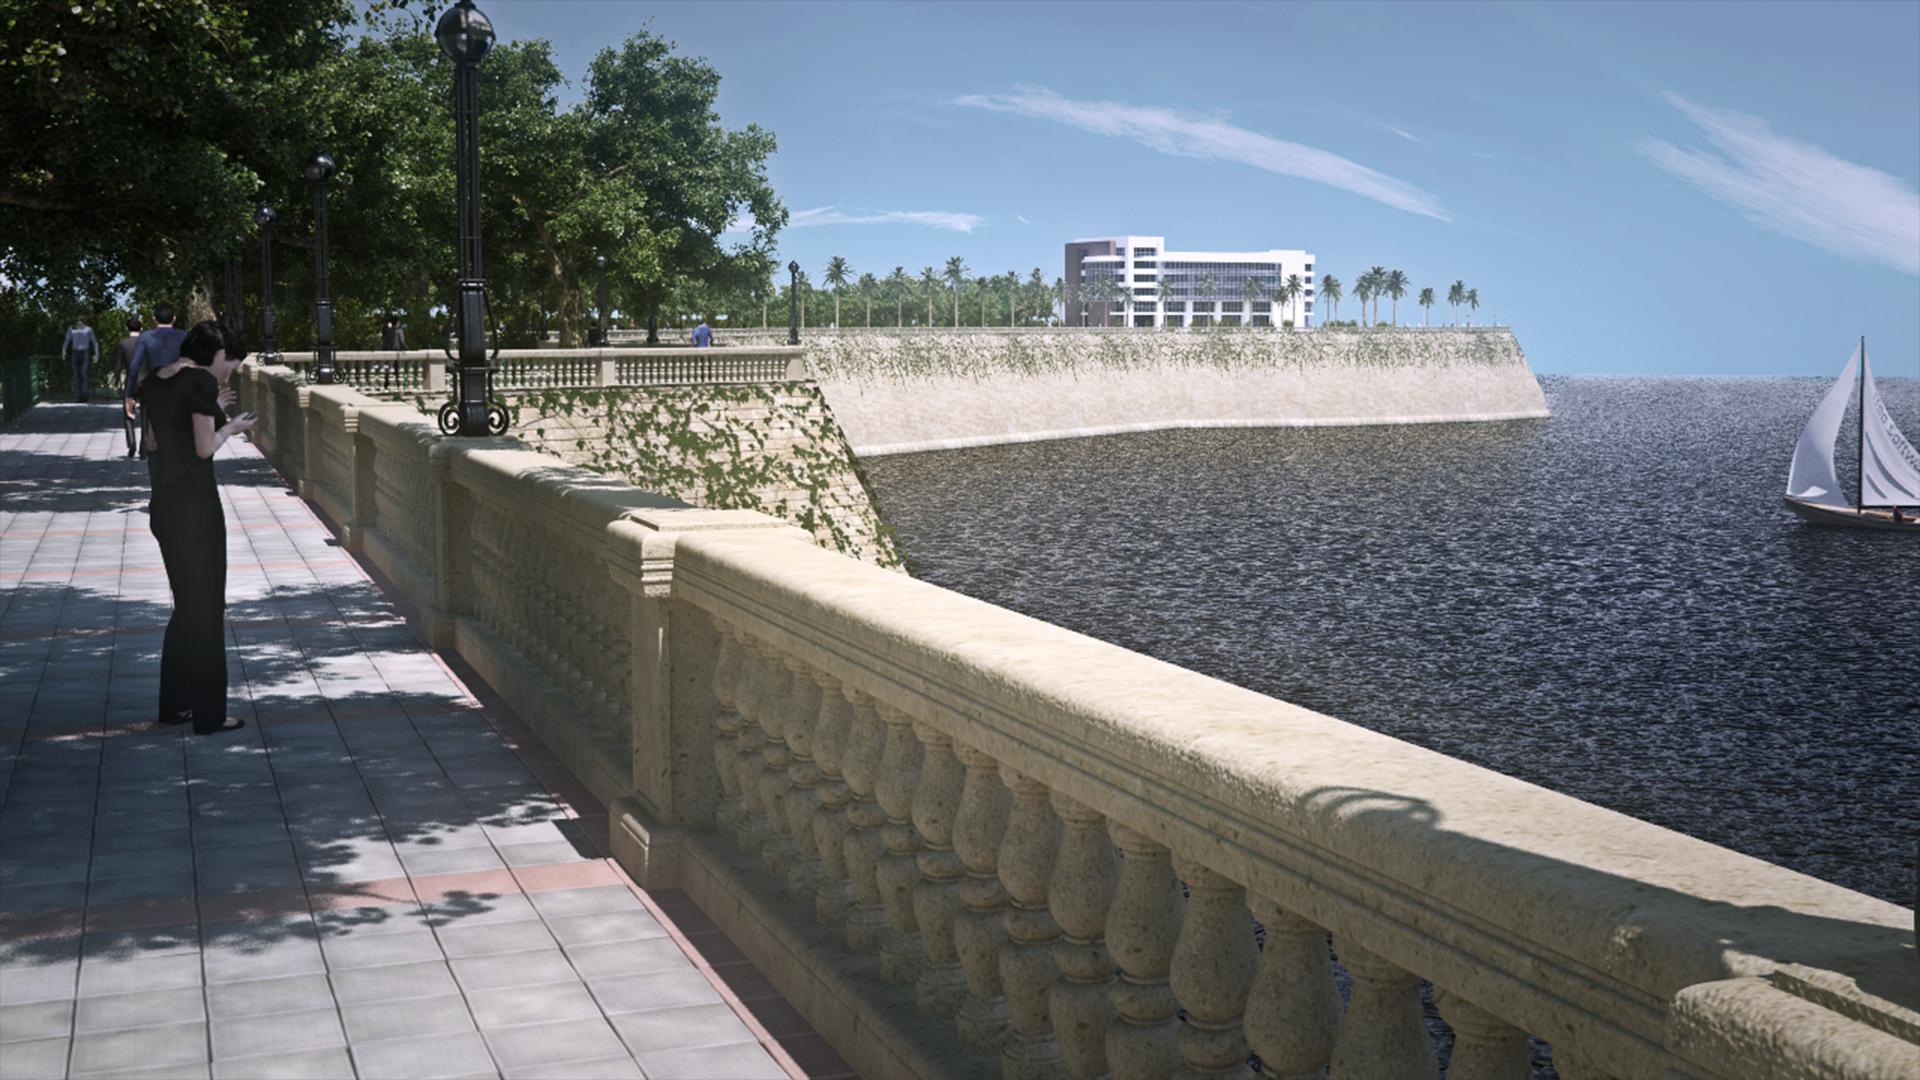 Create a seaside promenade